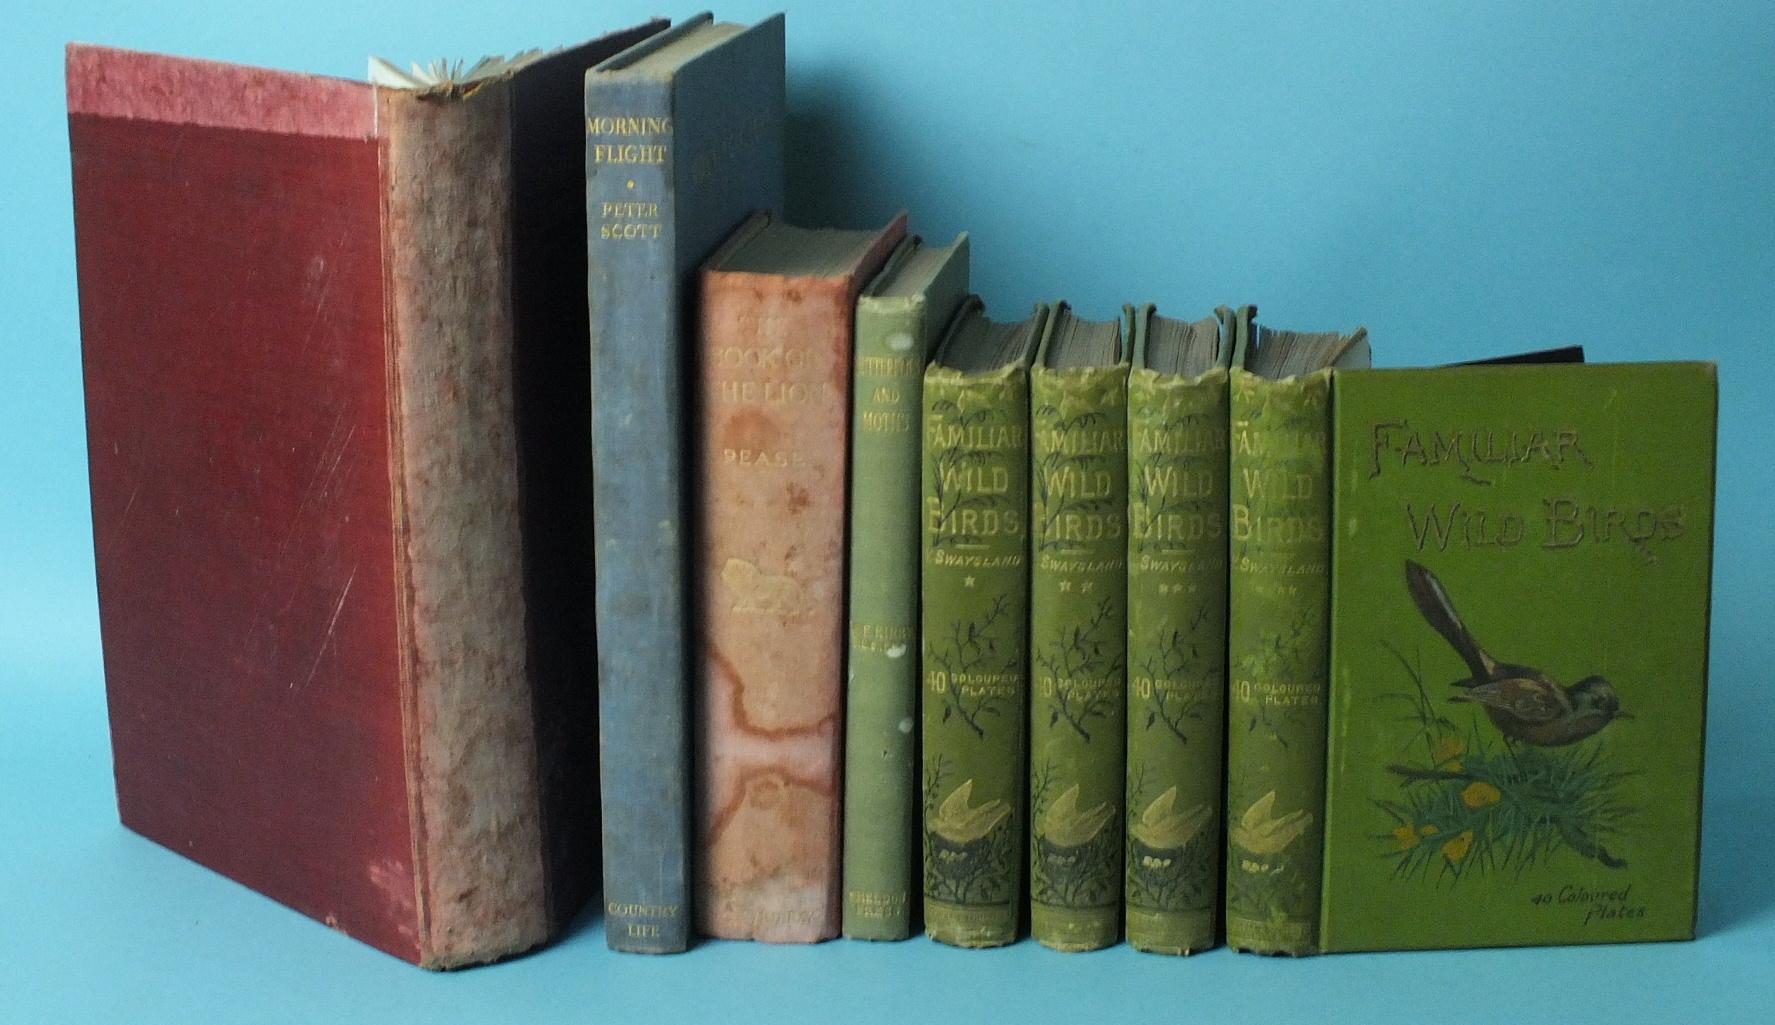 Lot 6 - Swaysland (W), Familiar Wild Birds, 4 vols, col plts by Archibald Thorburn, ge, pic cl gt, 8vo,